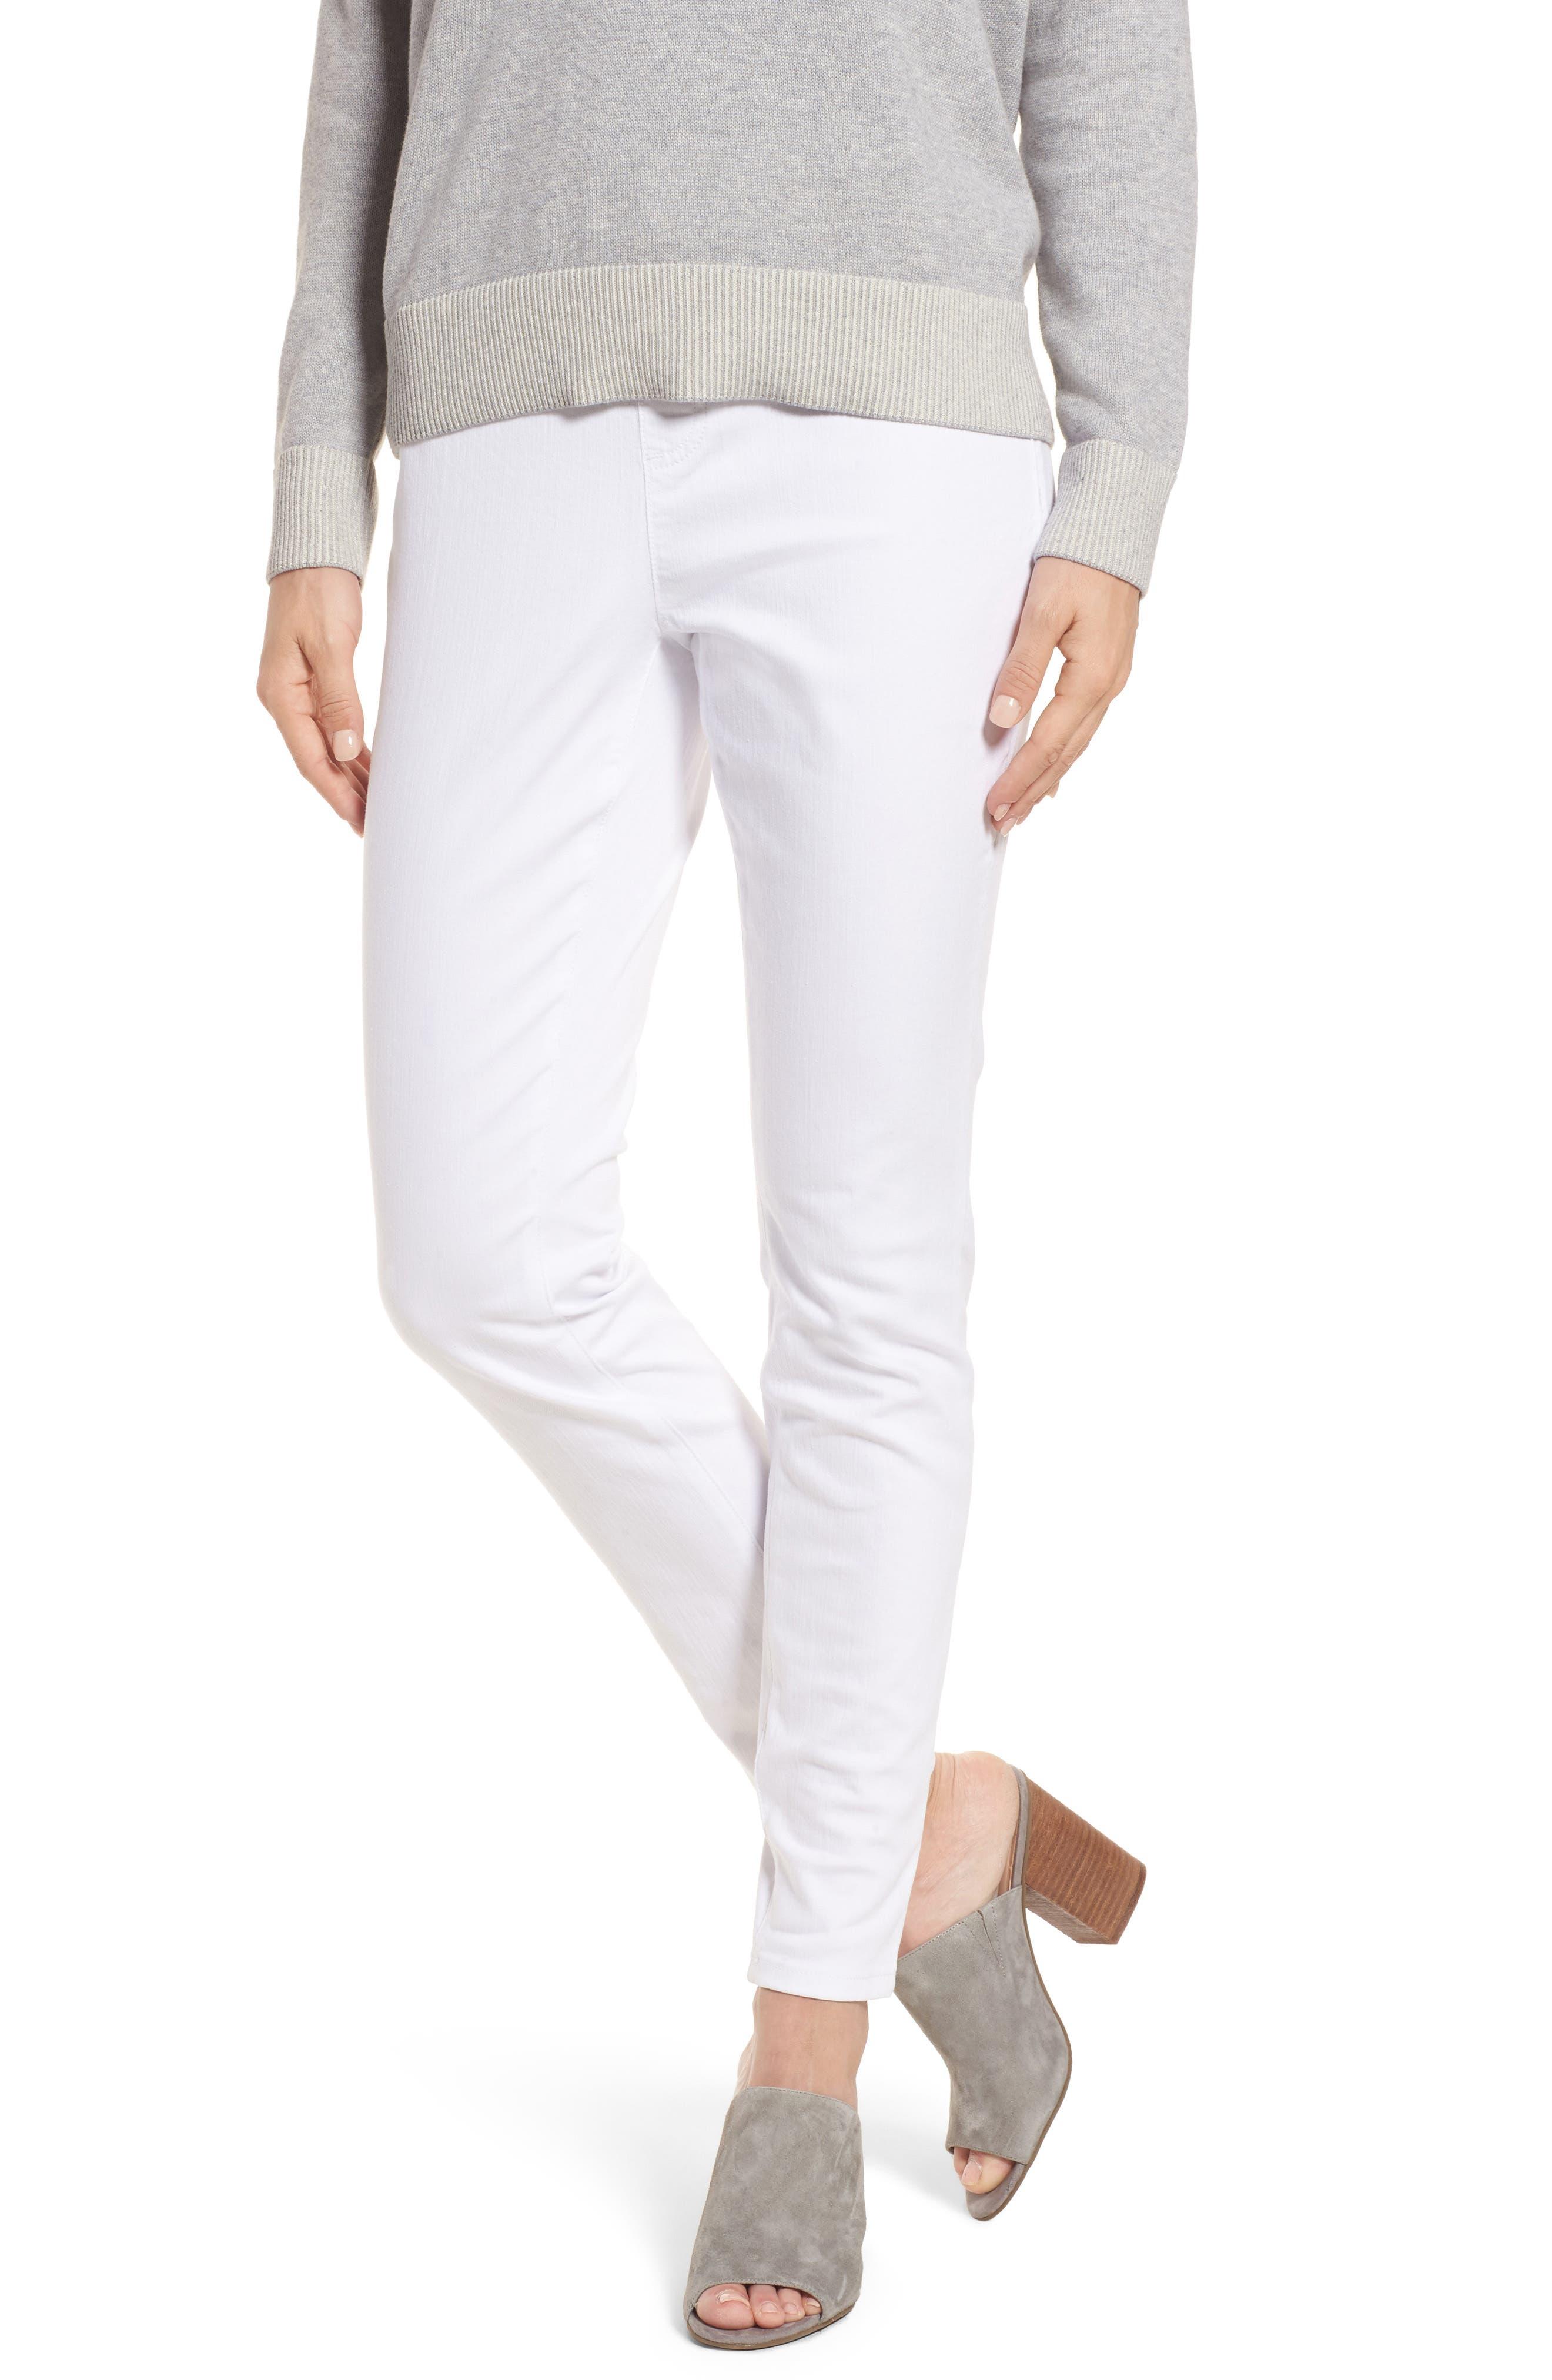 Stretch Organic Cotton Denim Skinny Pants,                         Main,                         color, White